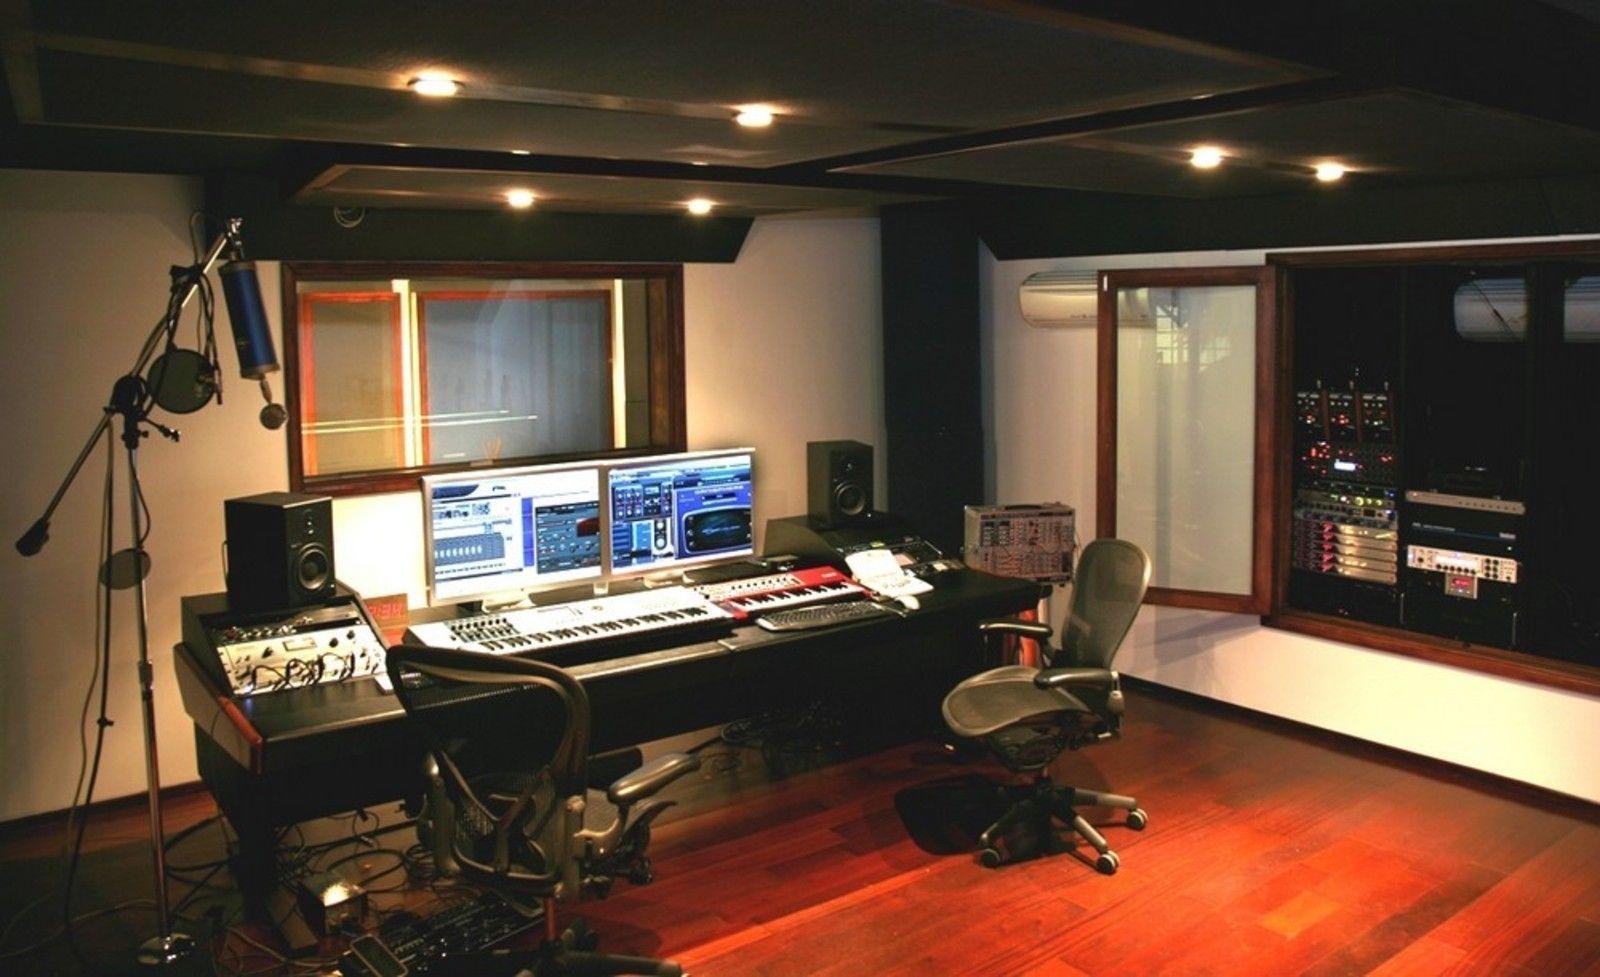 Das Studio von Infected Mushroom in L.A.